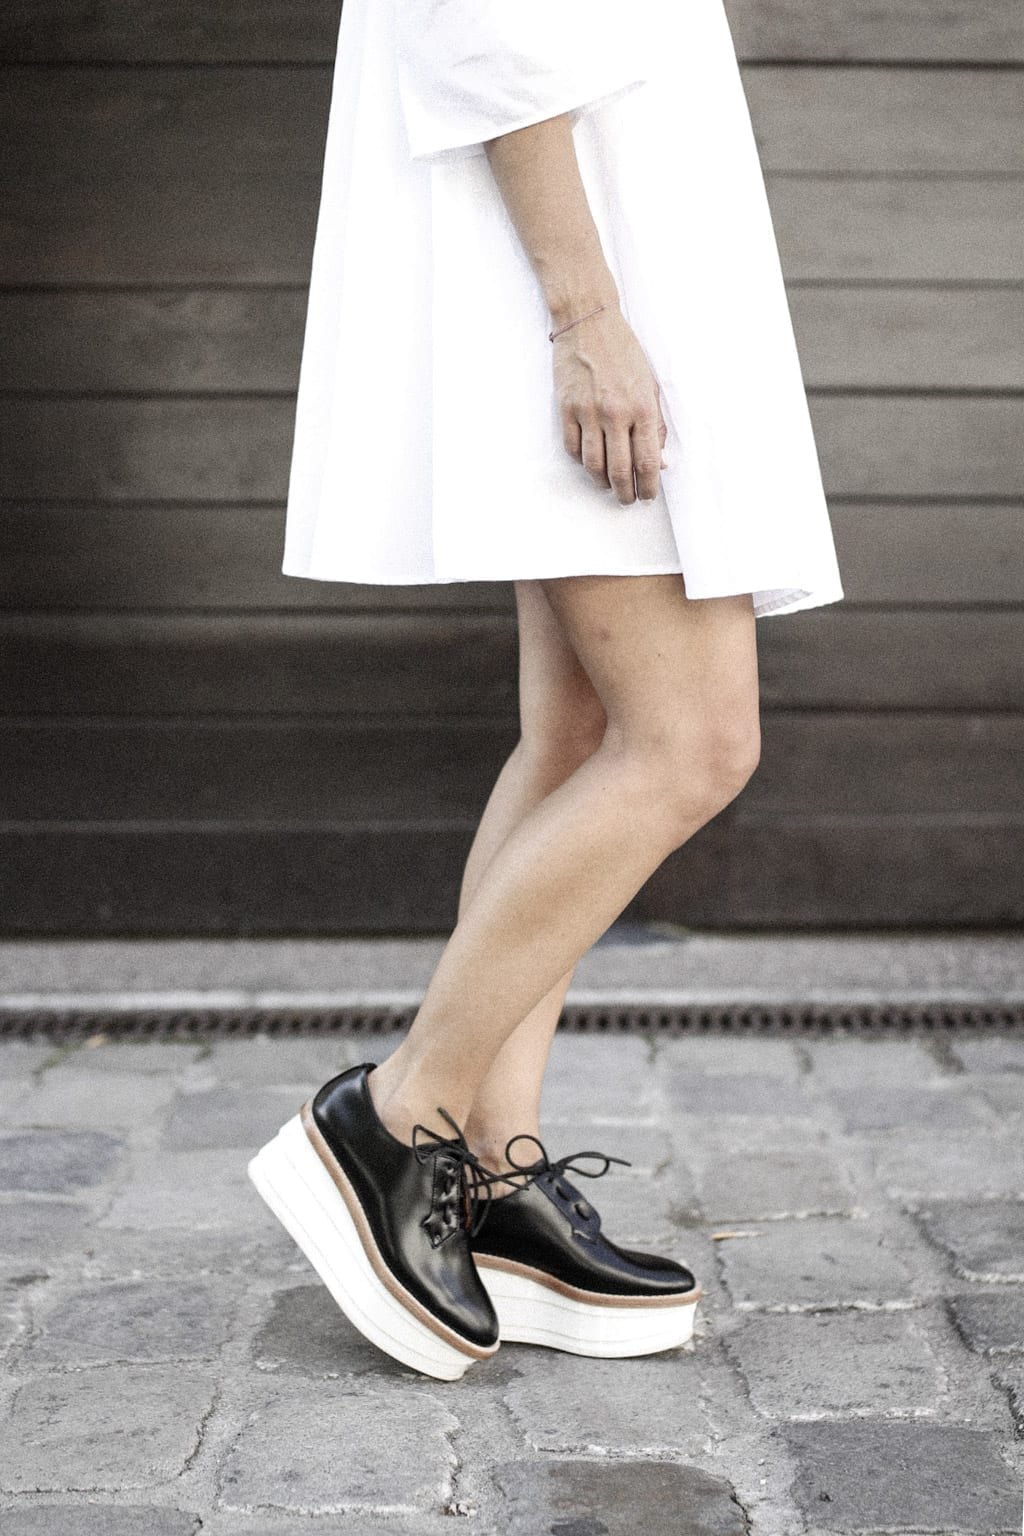 CK-constantly.com-Karin-Kaswurm-Fashion-Augsburg-Blog-2715